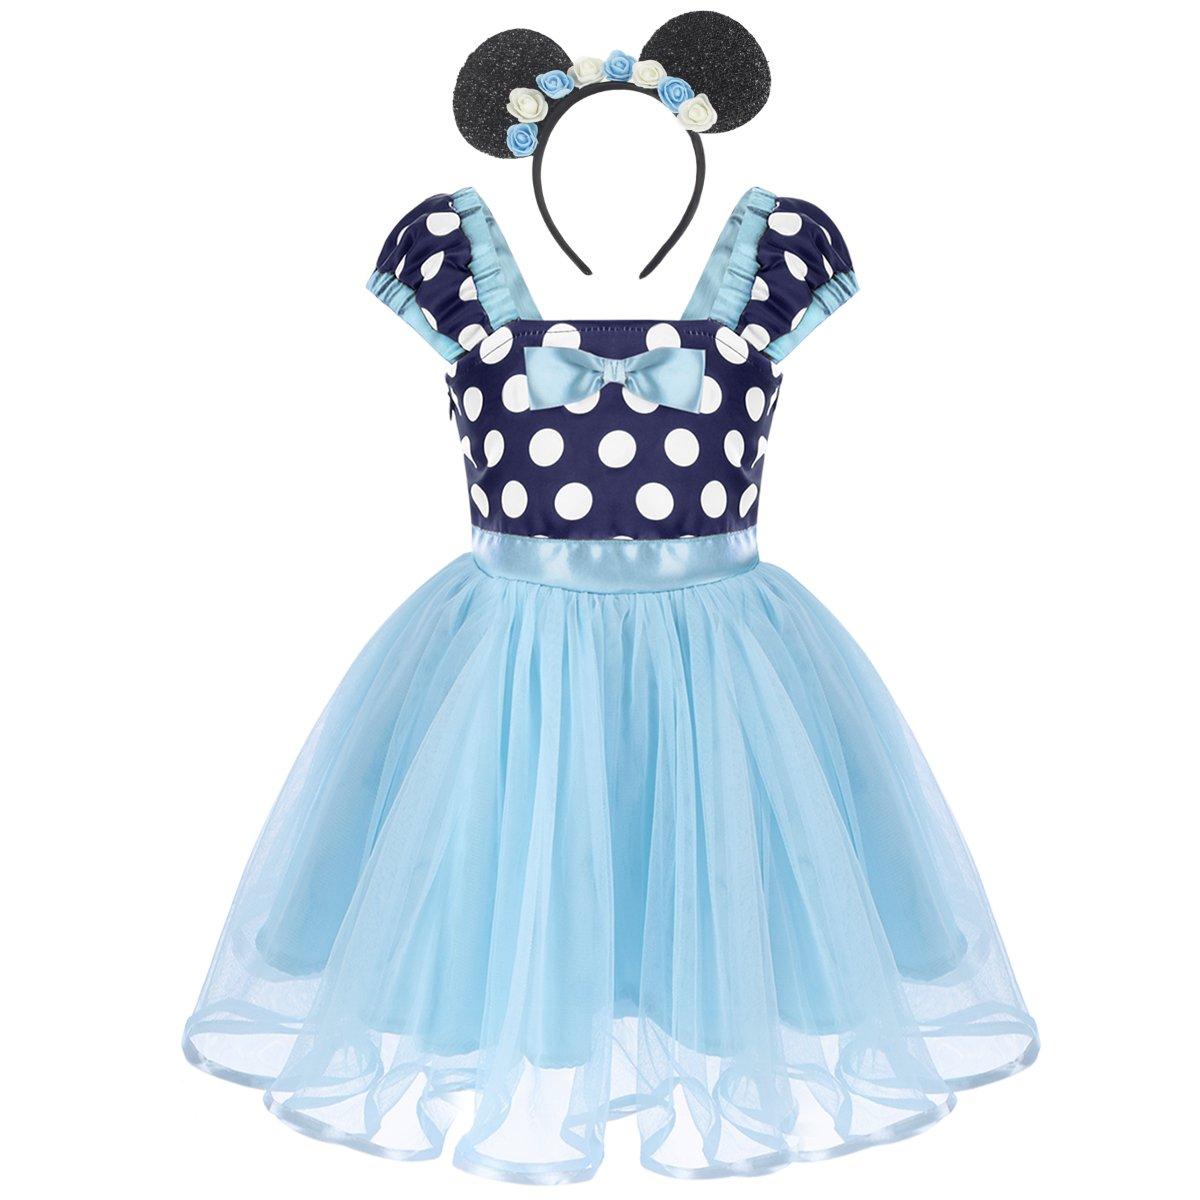 FYMNSI Baby Girls Polka Dots Princess Birthday Party Minnie Dress with Headband 0-4T